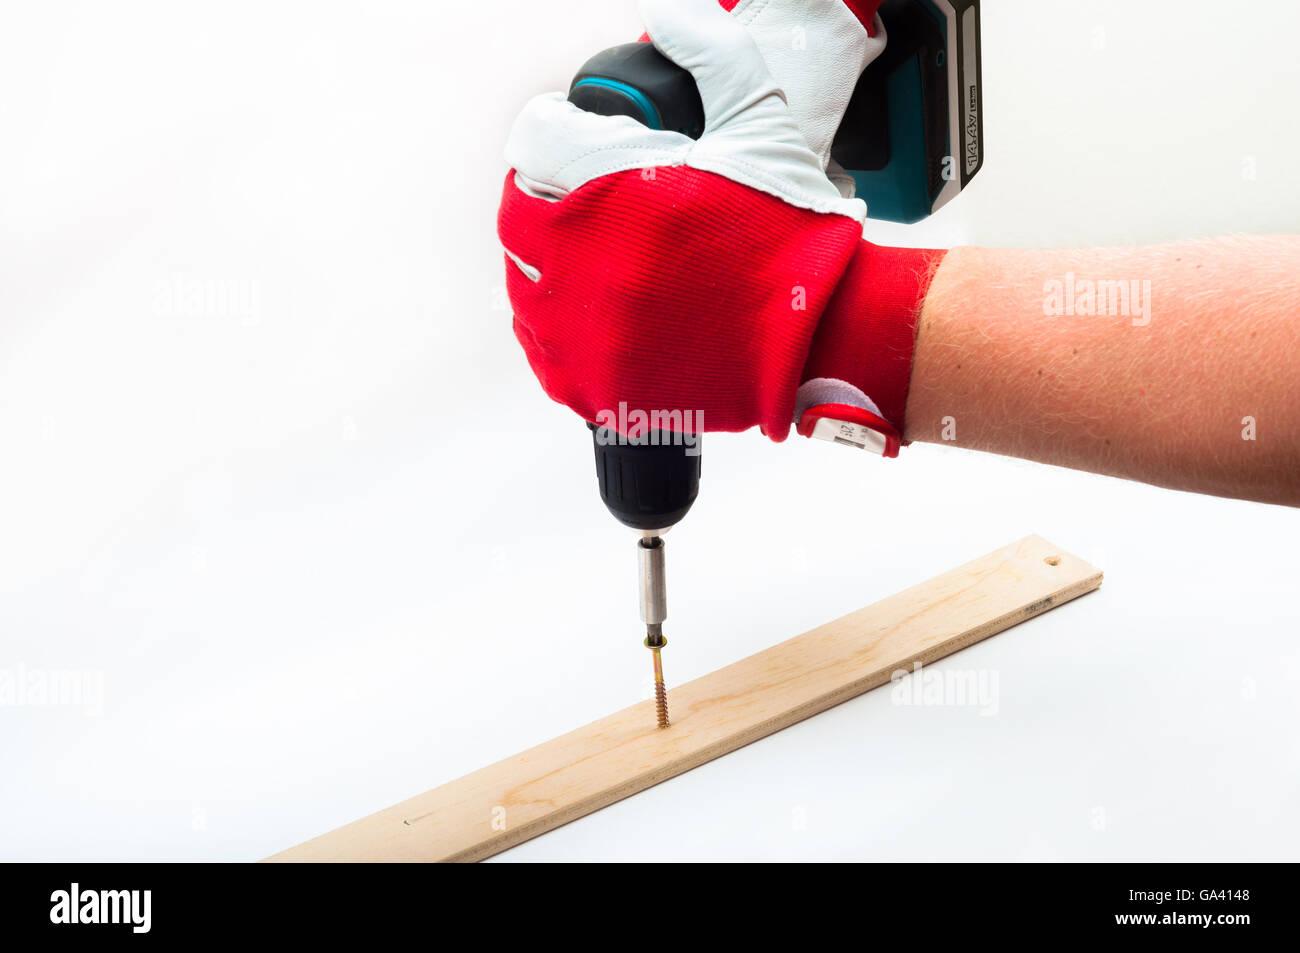 Screwing witn electrical screwdriver - Stock Image